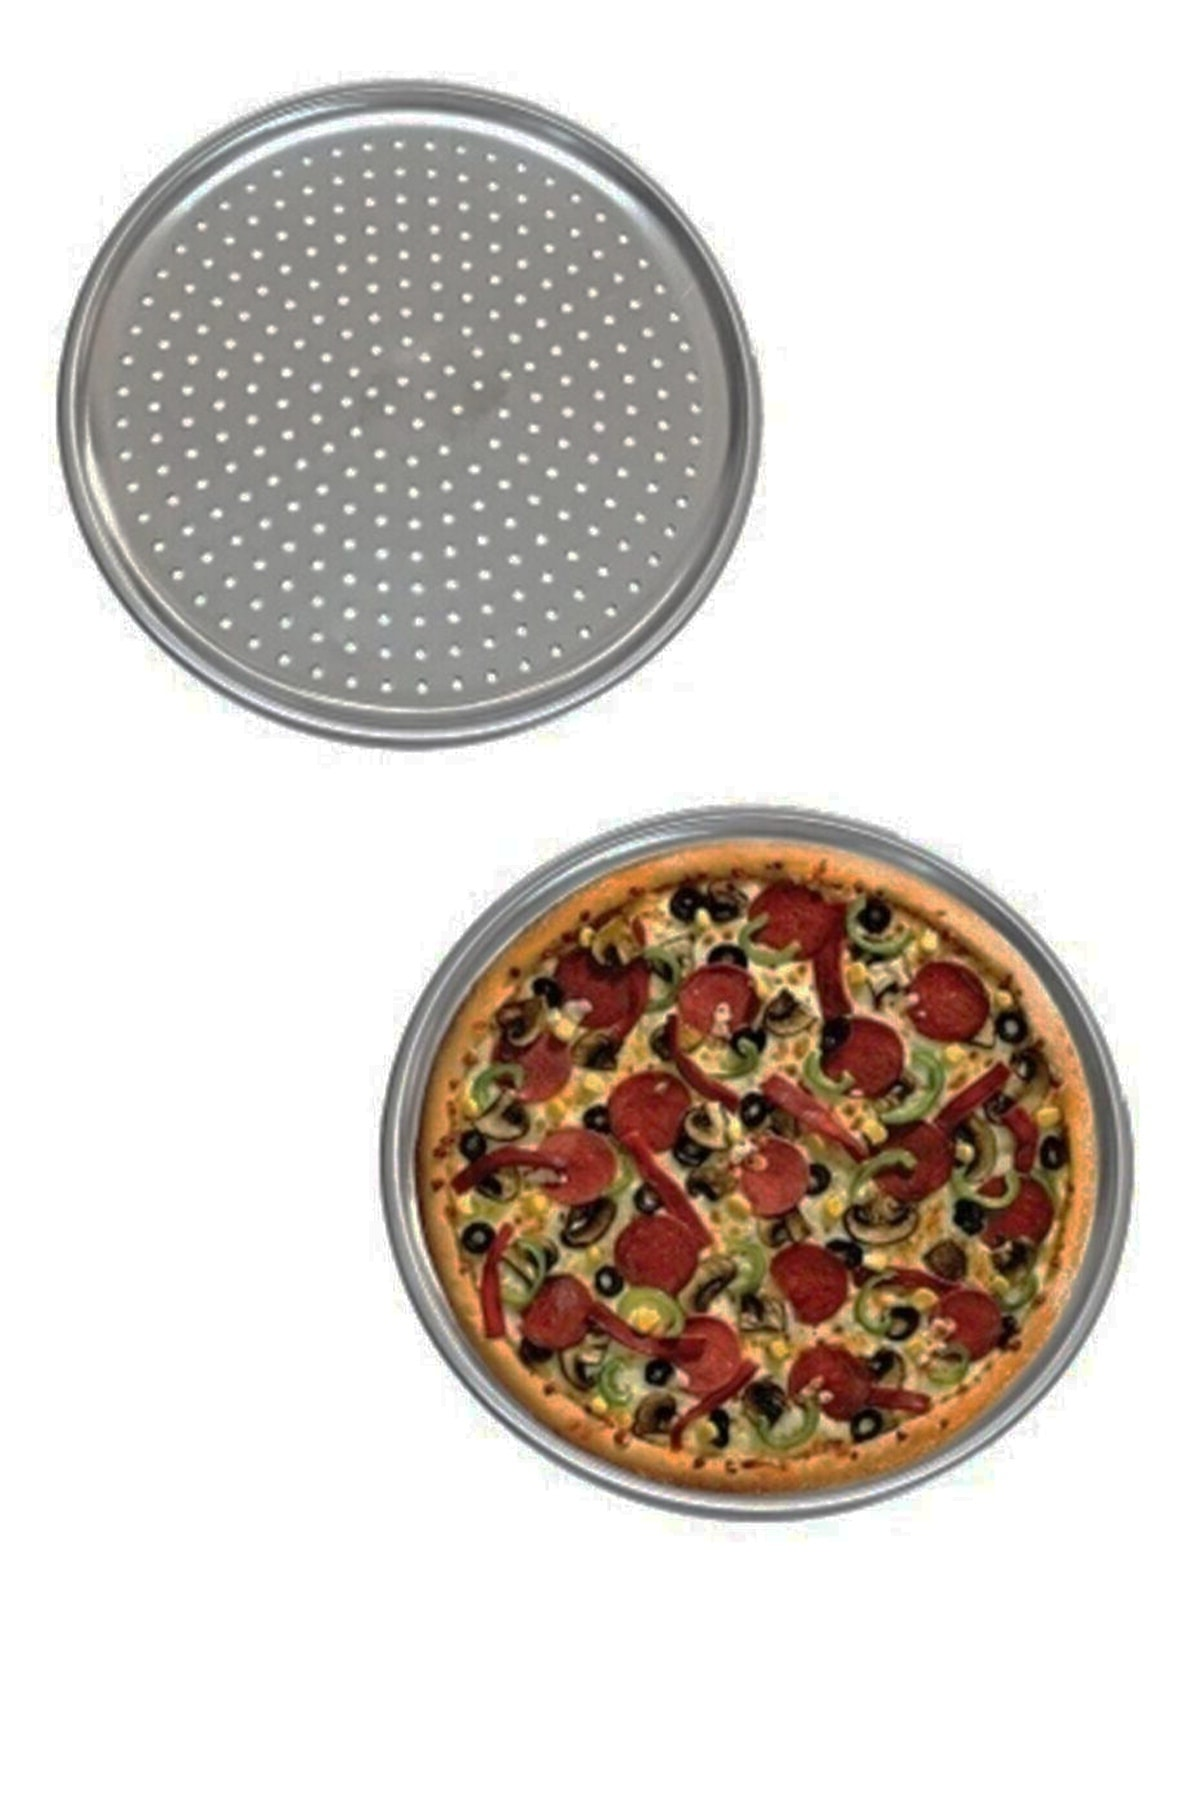 Delikli Pizza Tepsisi Lahmacun Pide Tepsisi 32cm 2 Adet